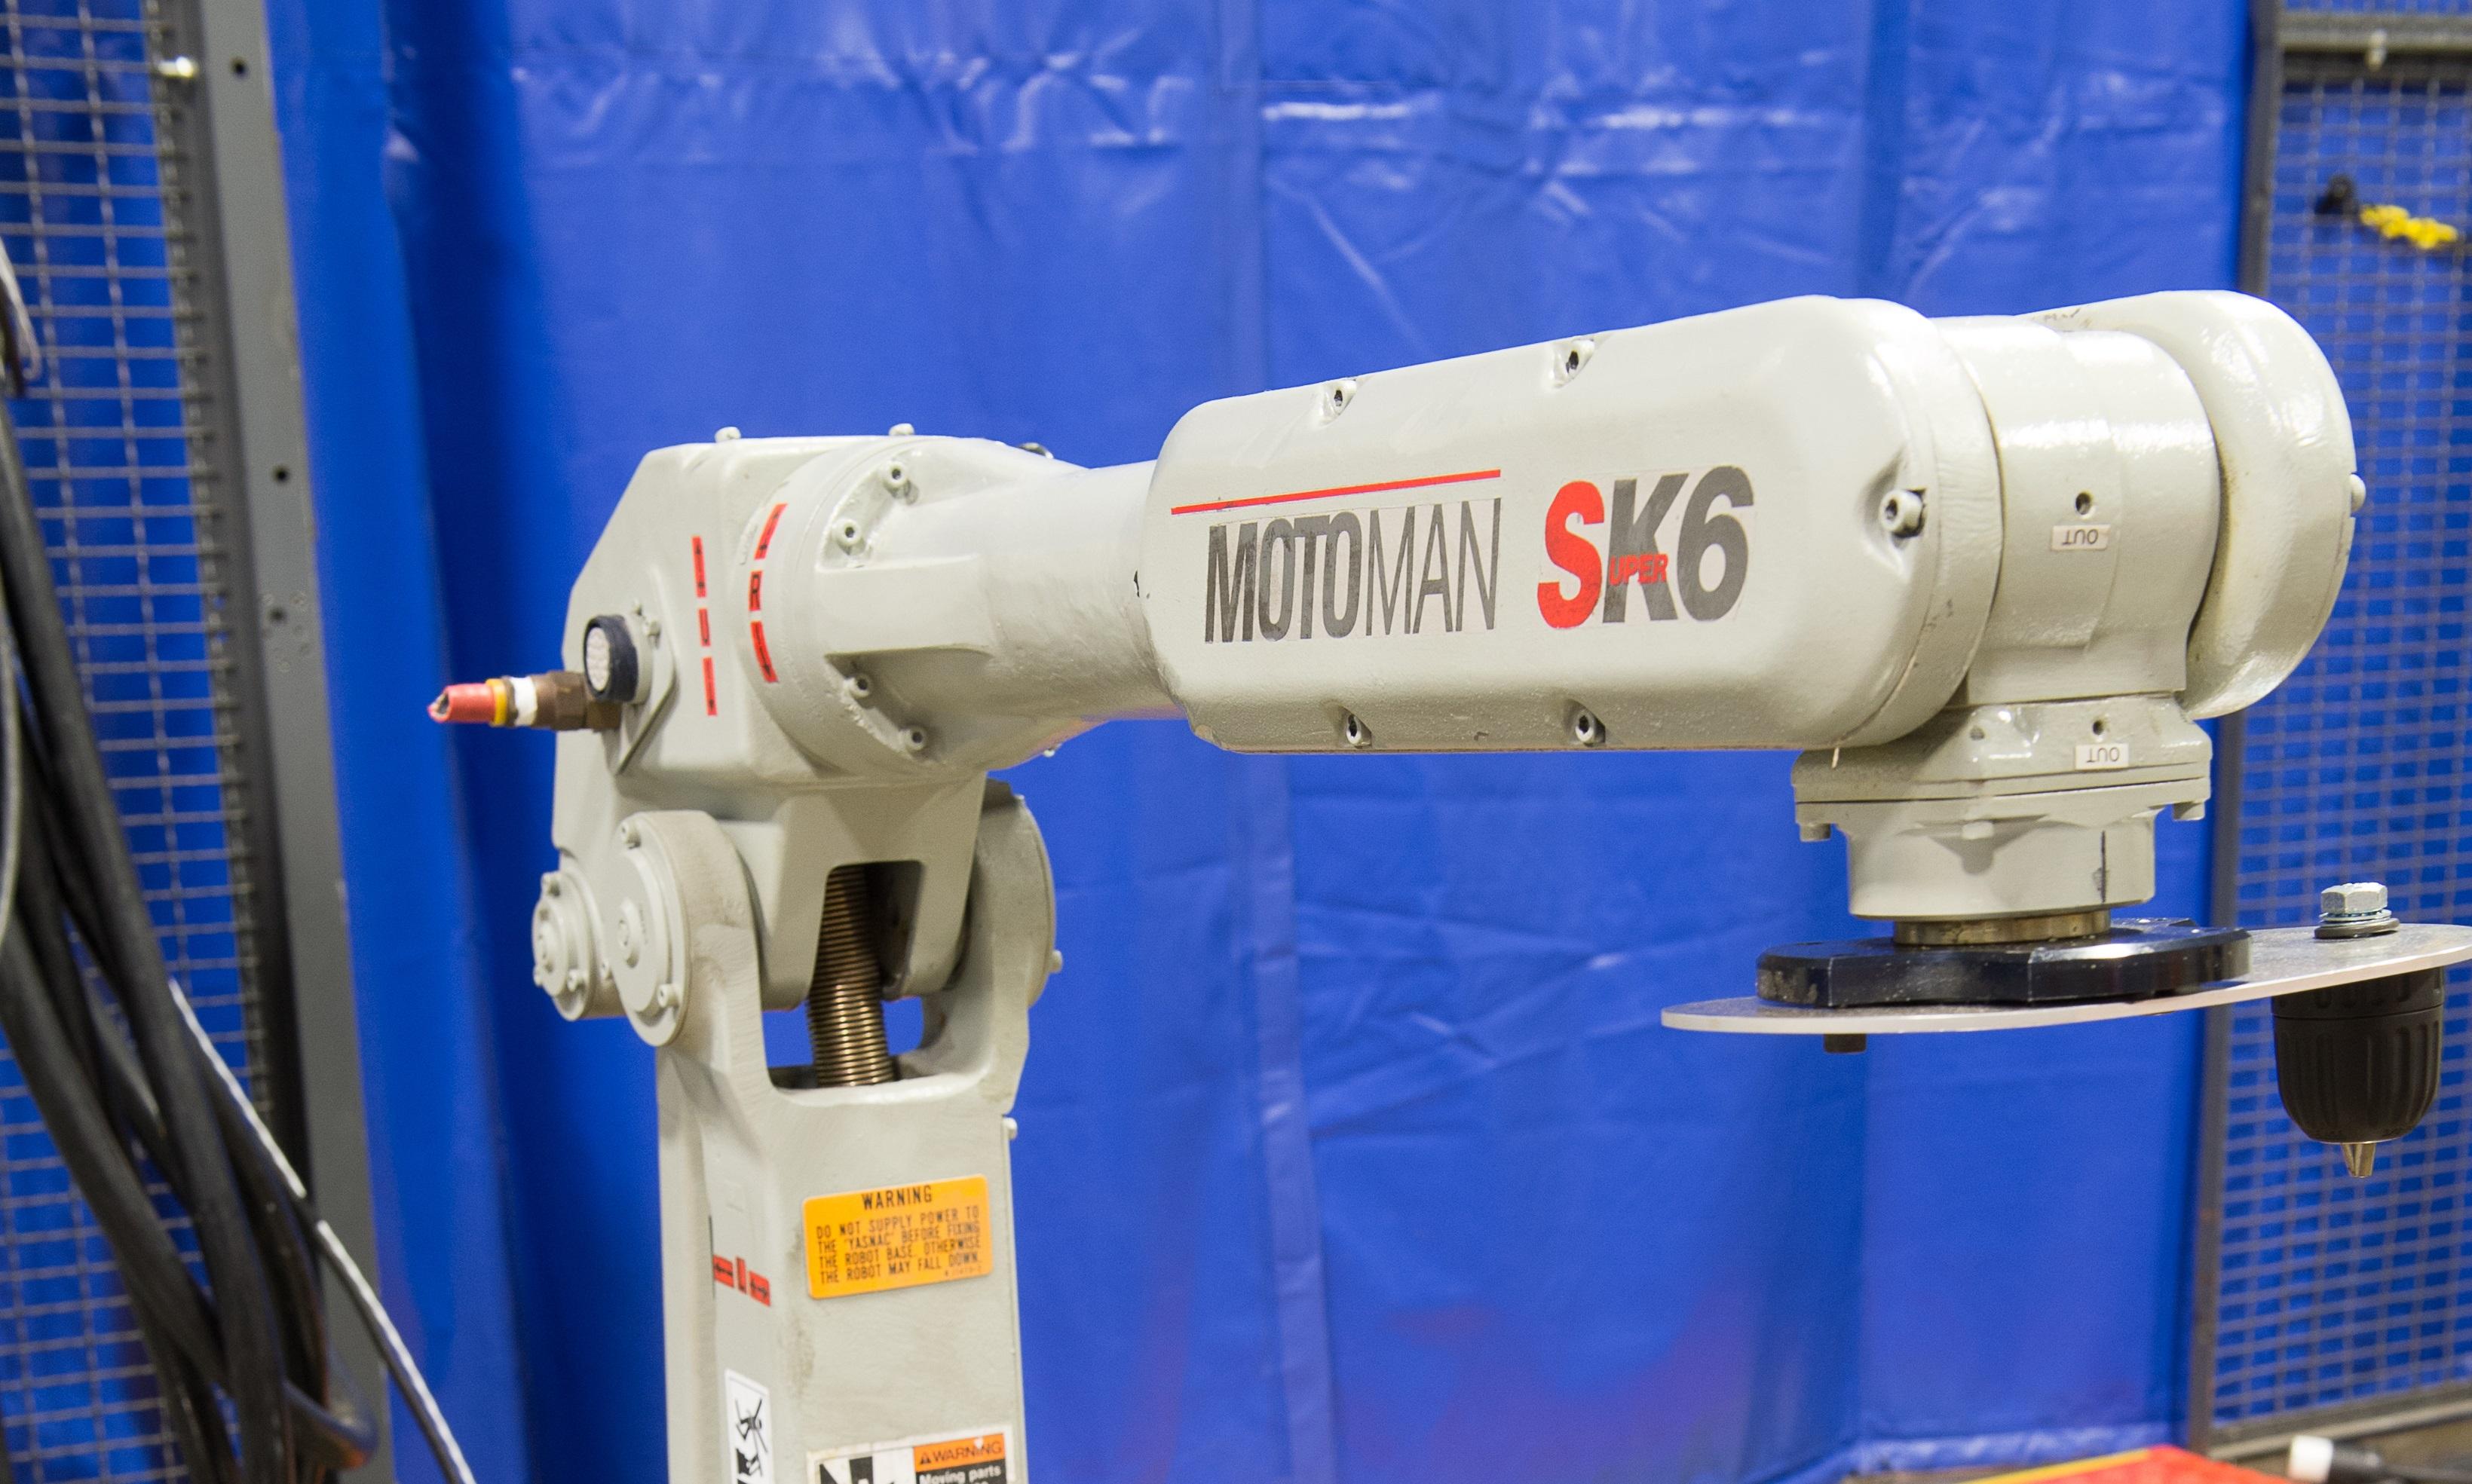 Motoman Legacy Mrc And Erc Series Robots Icr Services